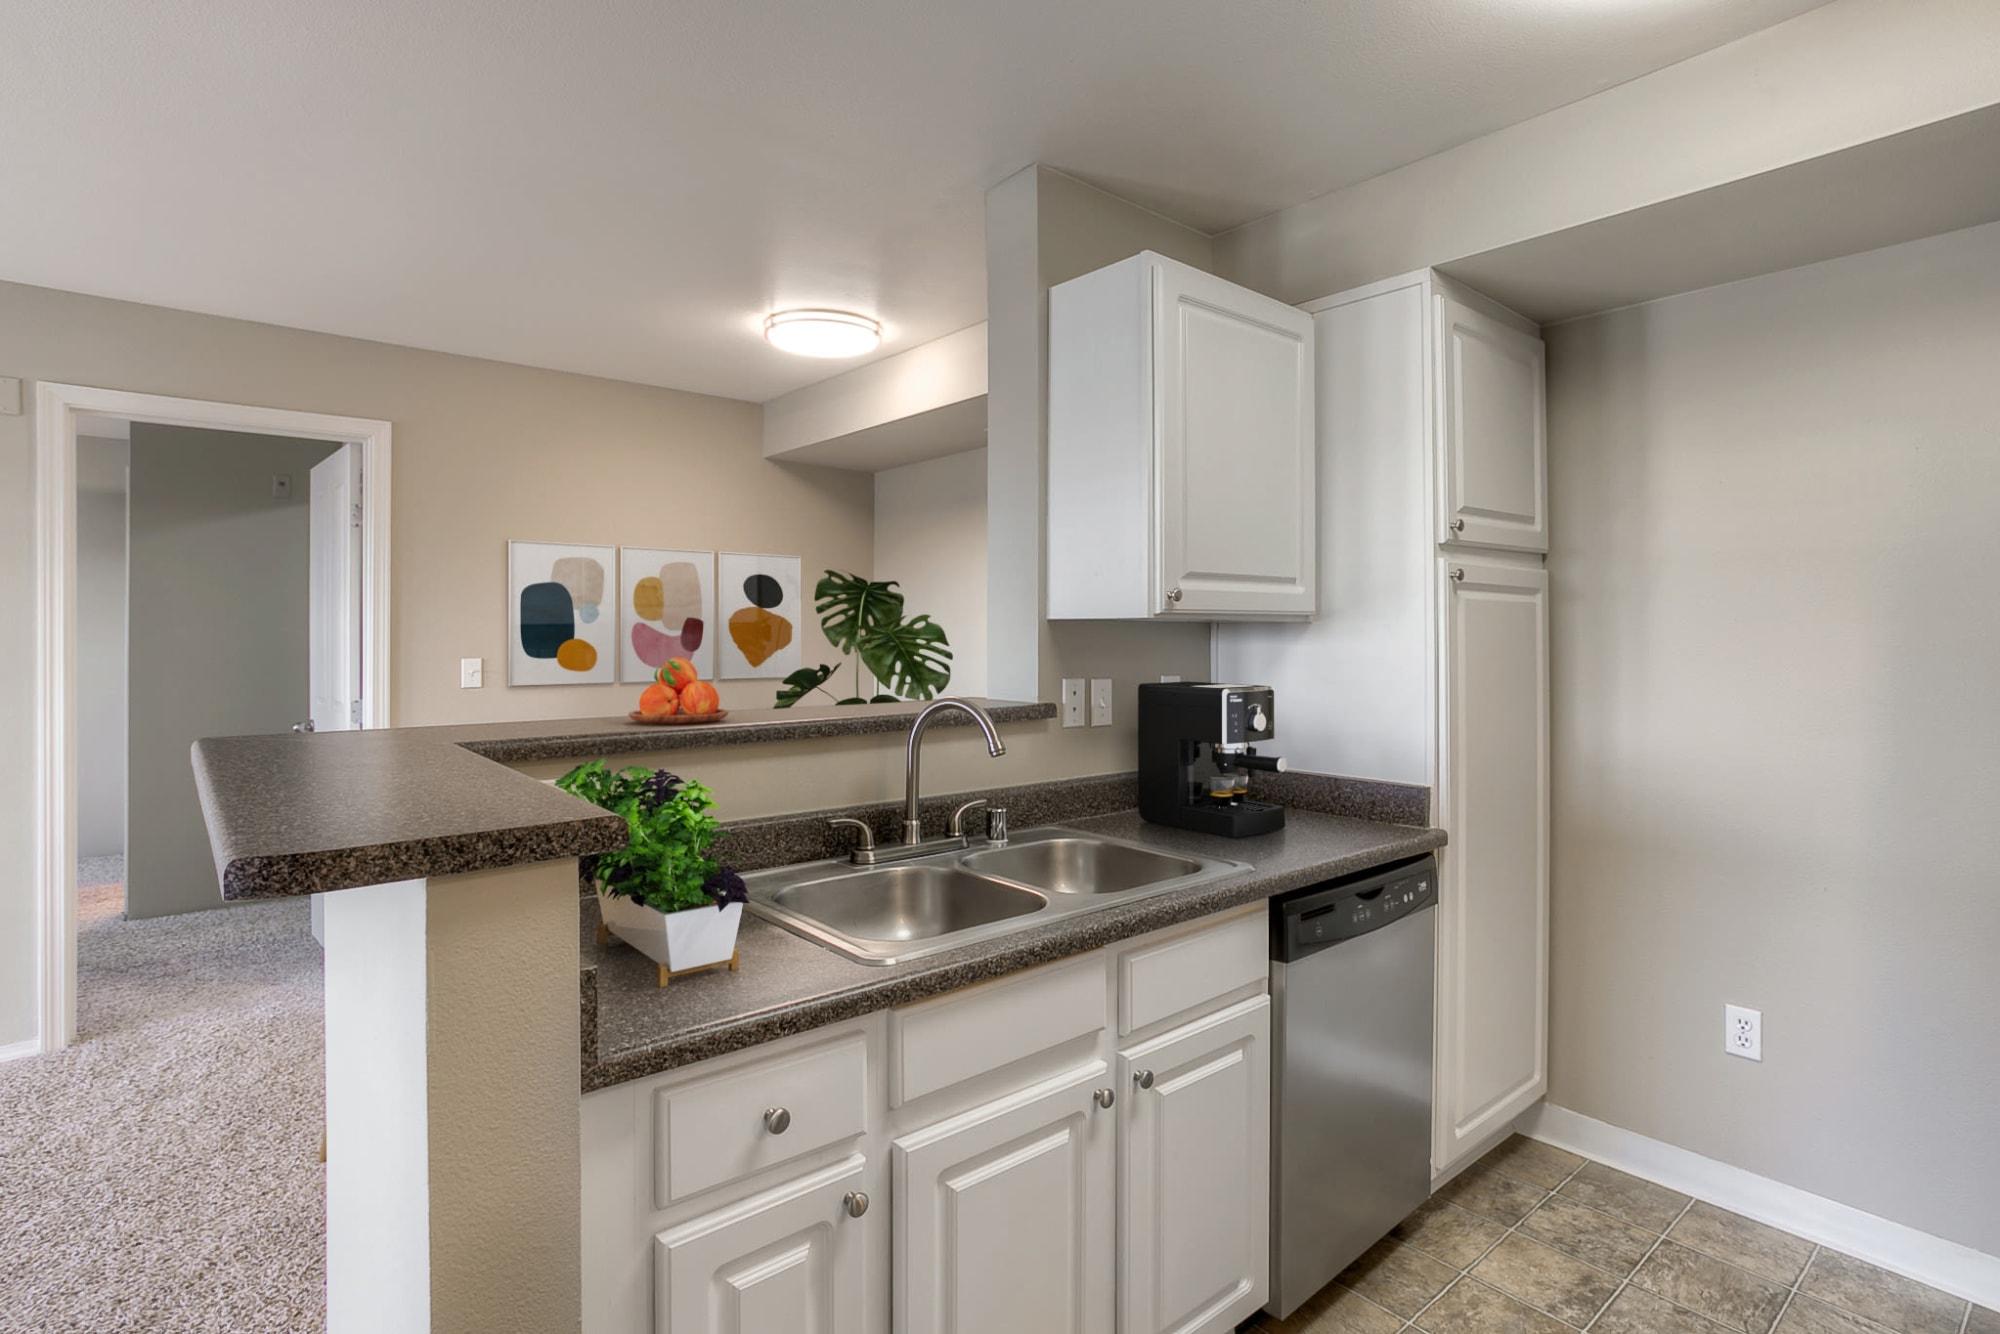 Kitchen, open floor plan at Pebble Cove Apartments in Renton